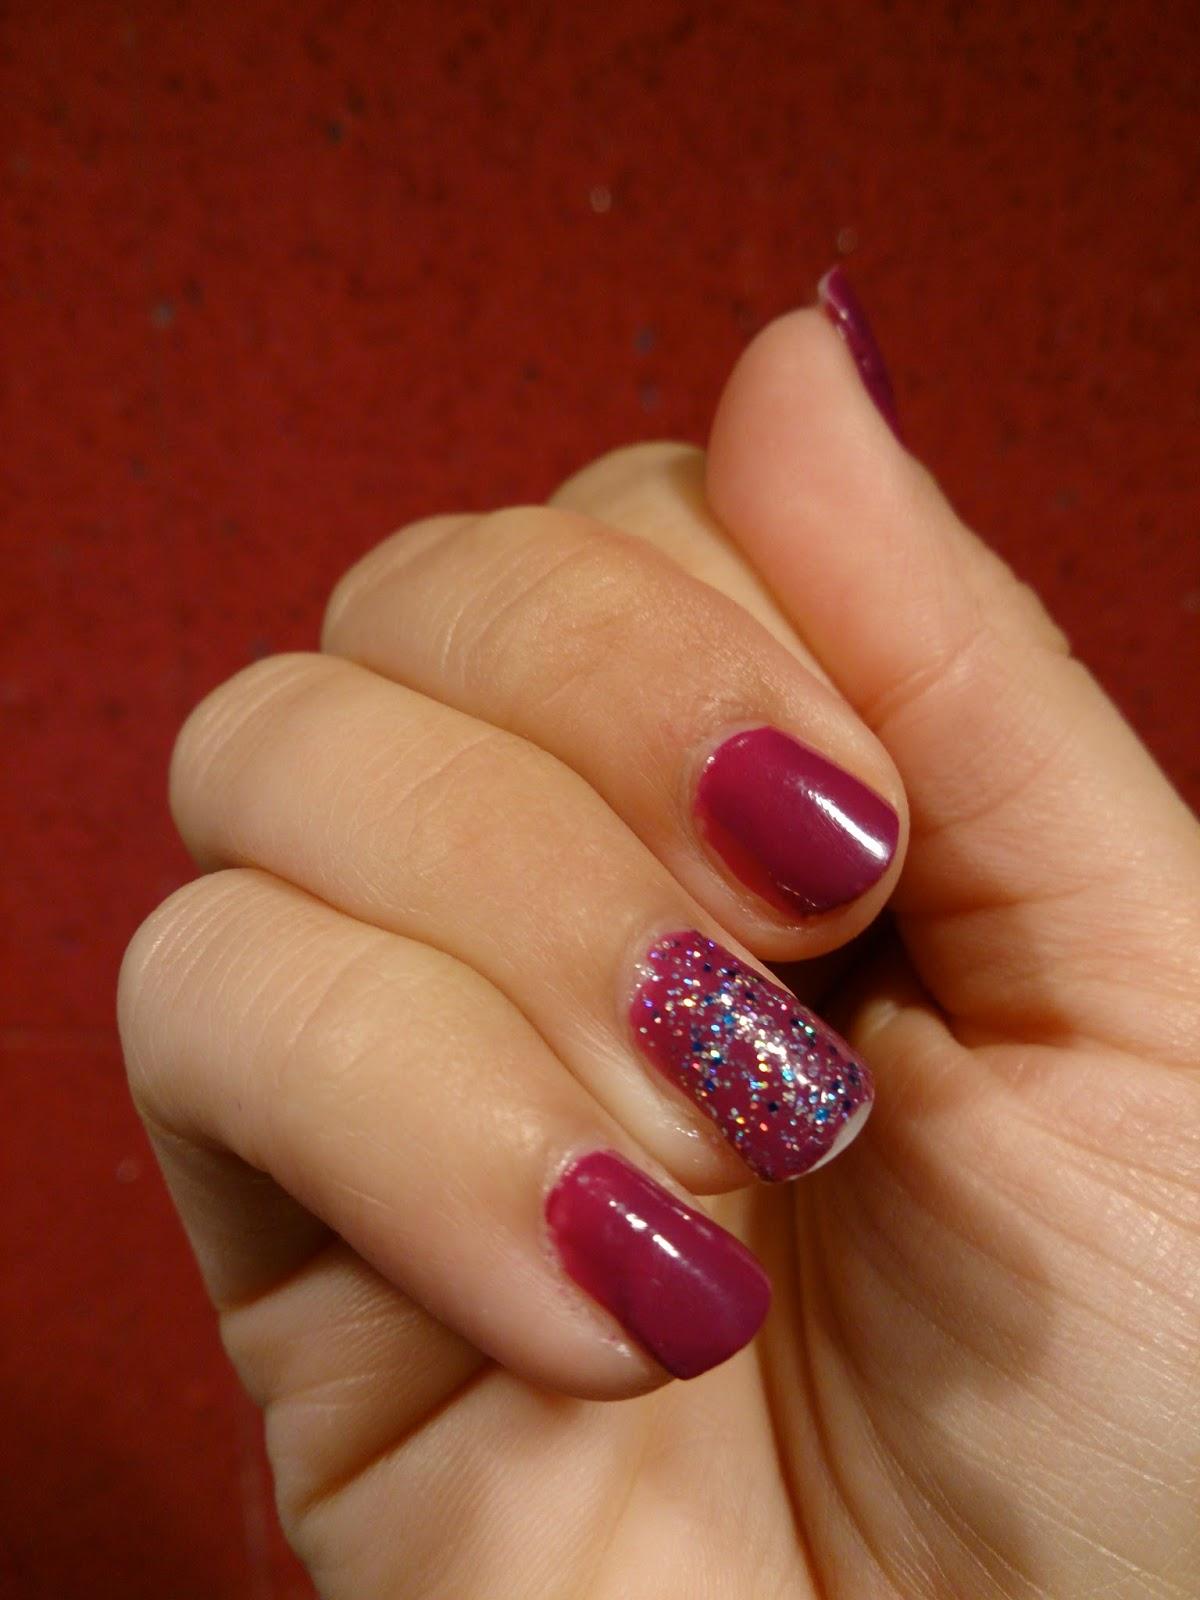 barry m rimmel nail blog purple glitter polish varnish